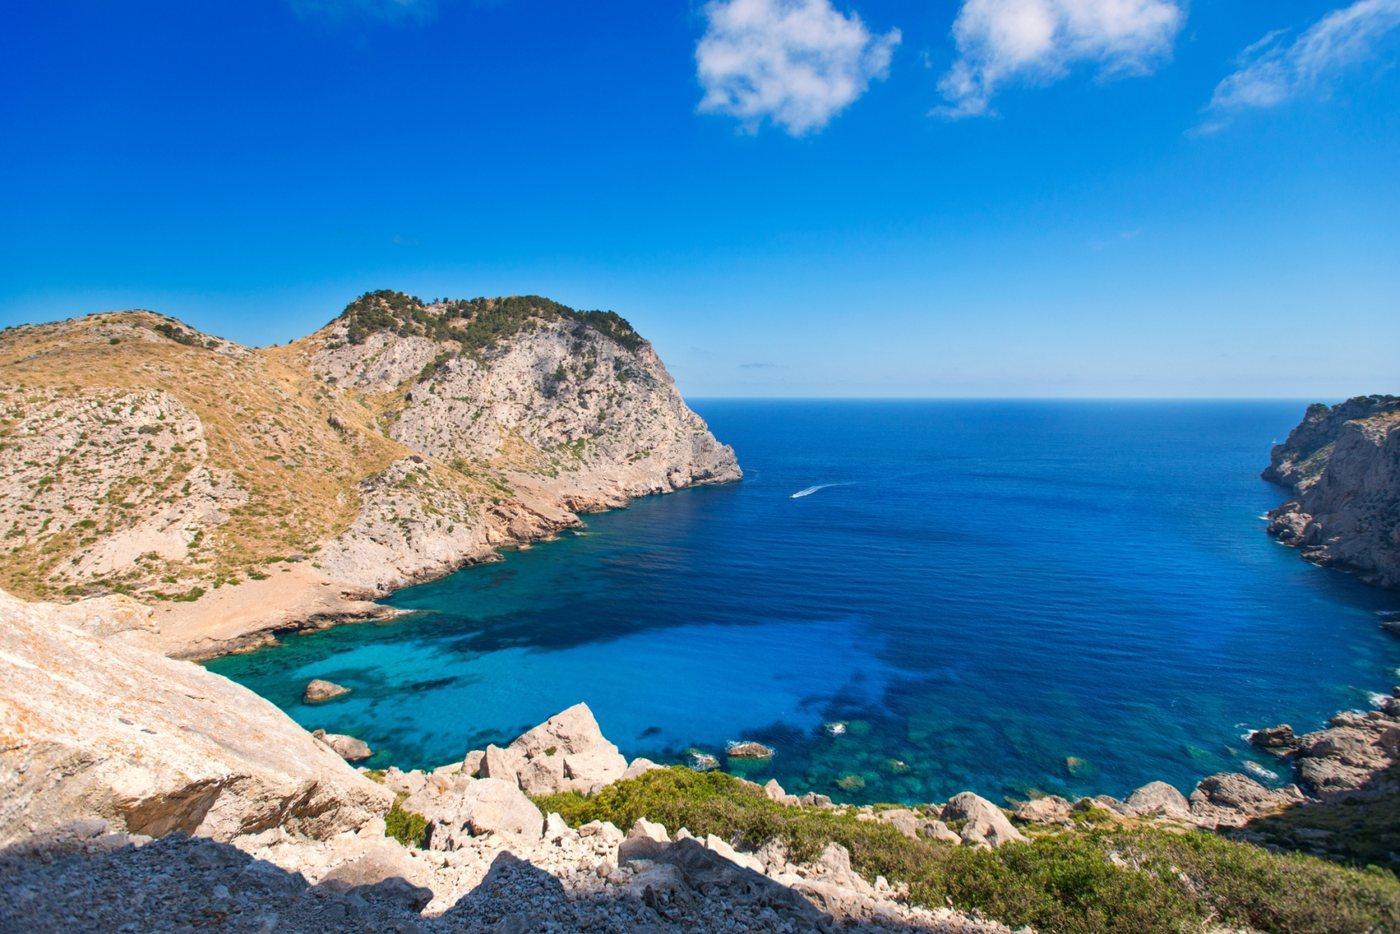 Photo Tour of The Balearics 3